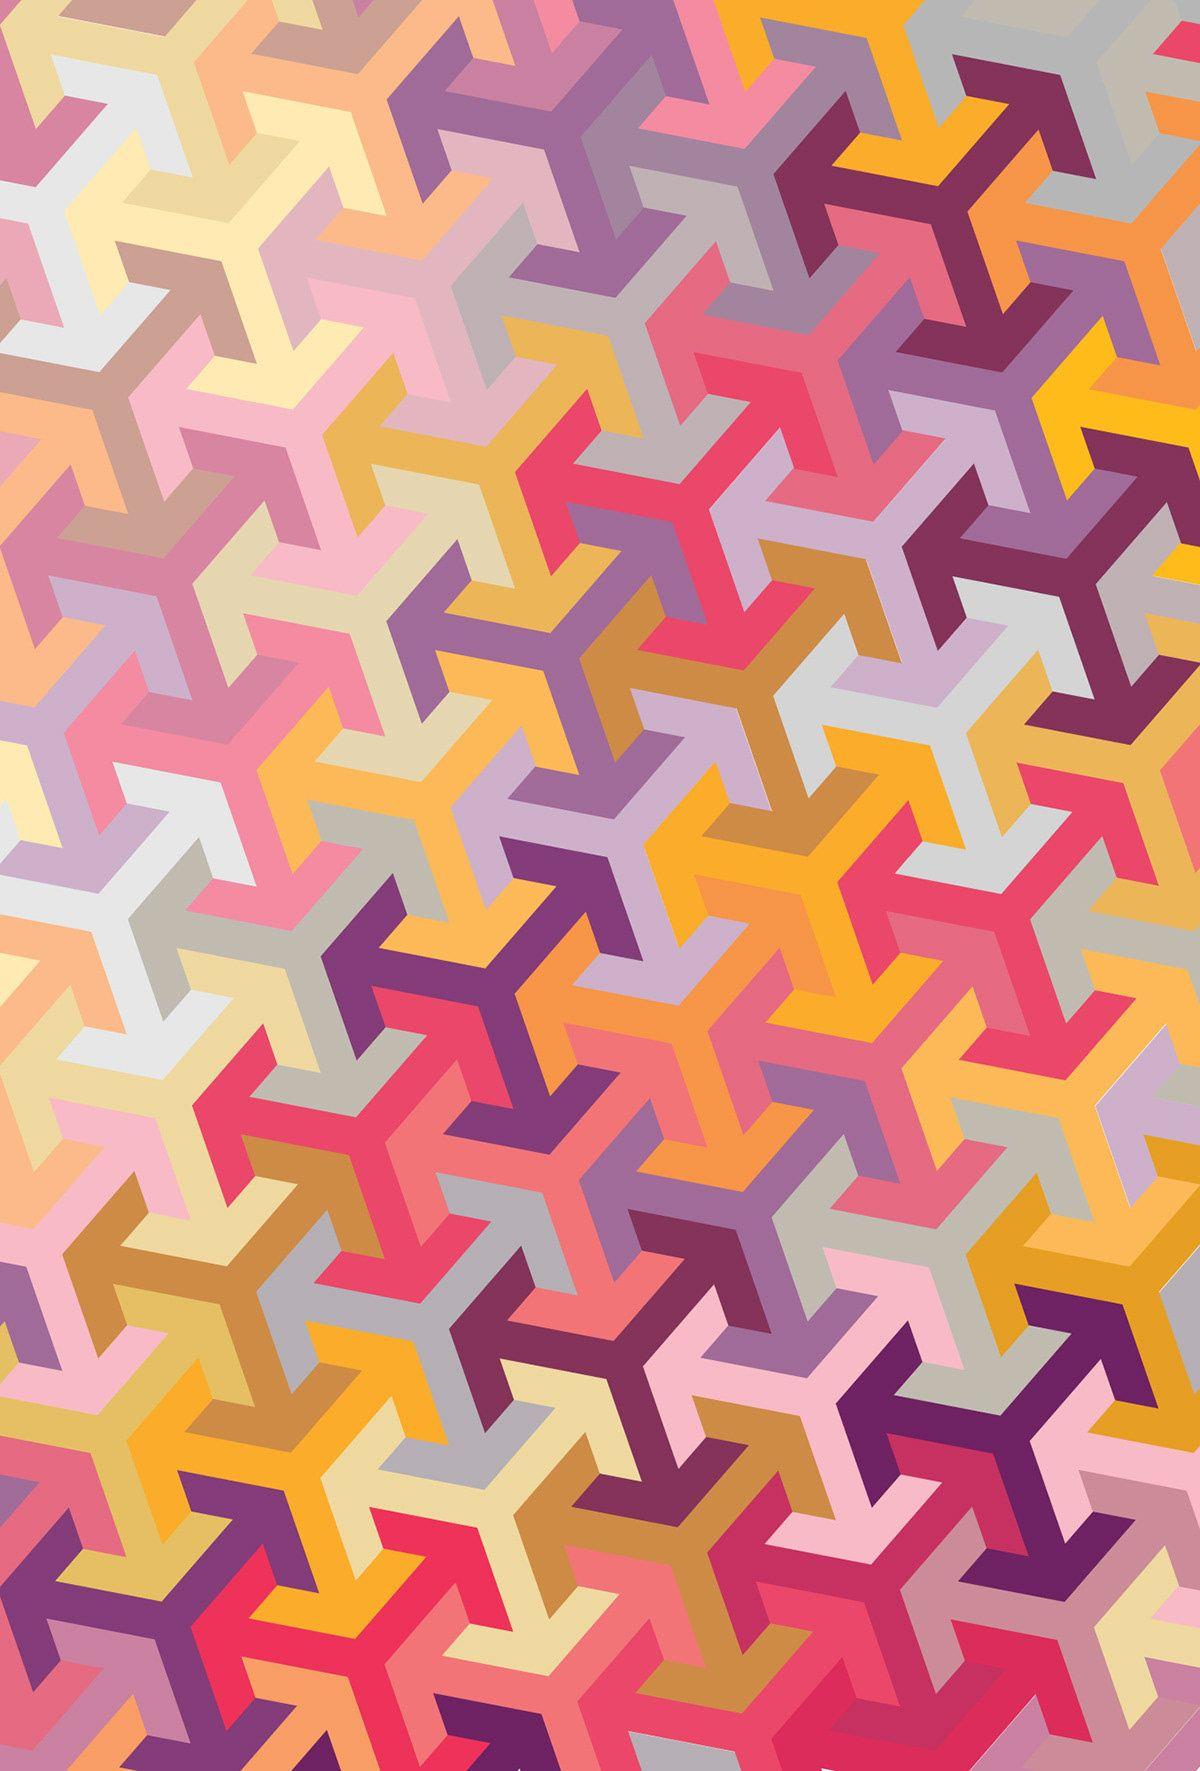 Textile patterns design motifs textiles pink graphic geometric also pin on watercolor flowers rh pinterest